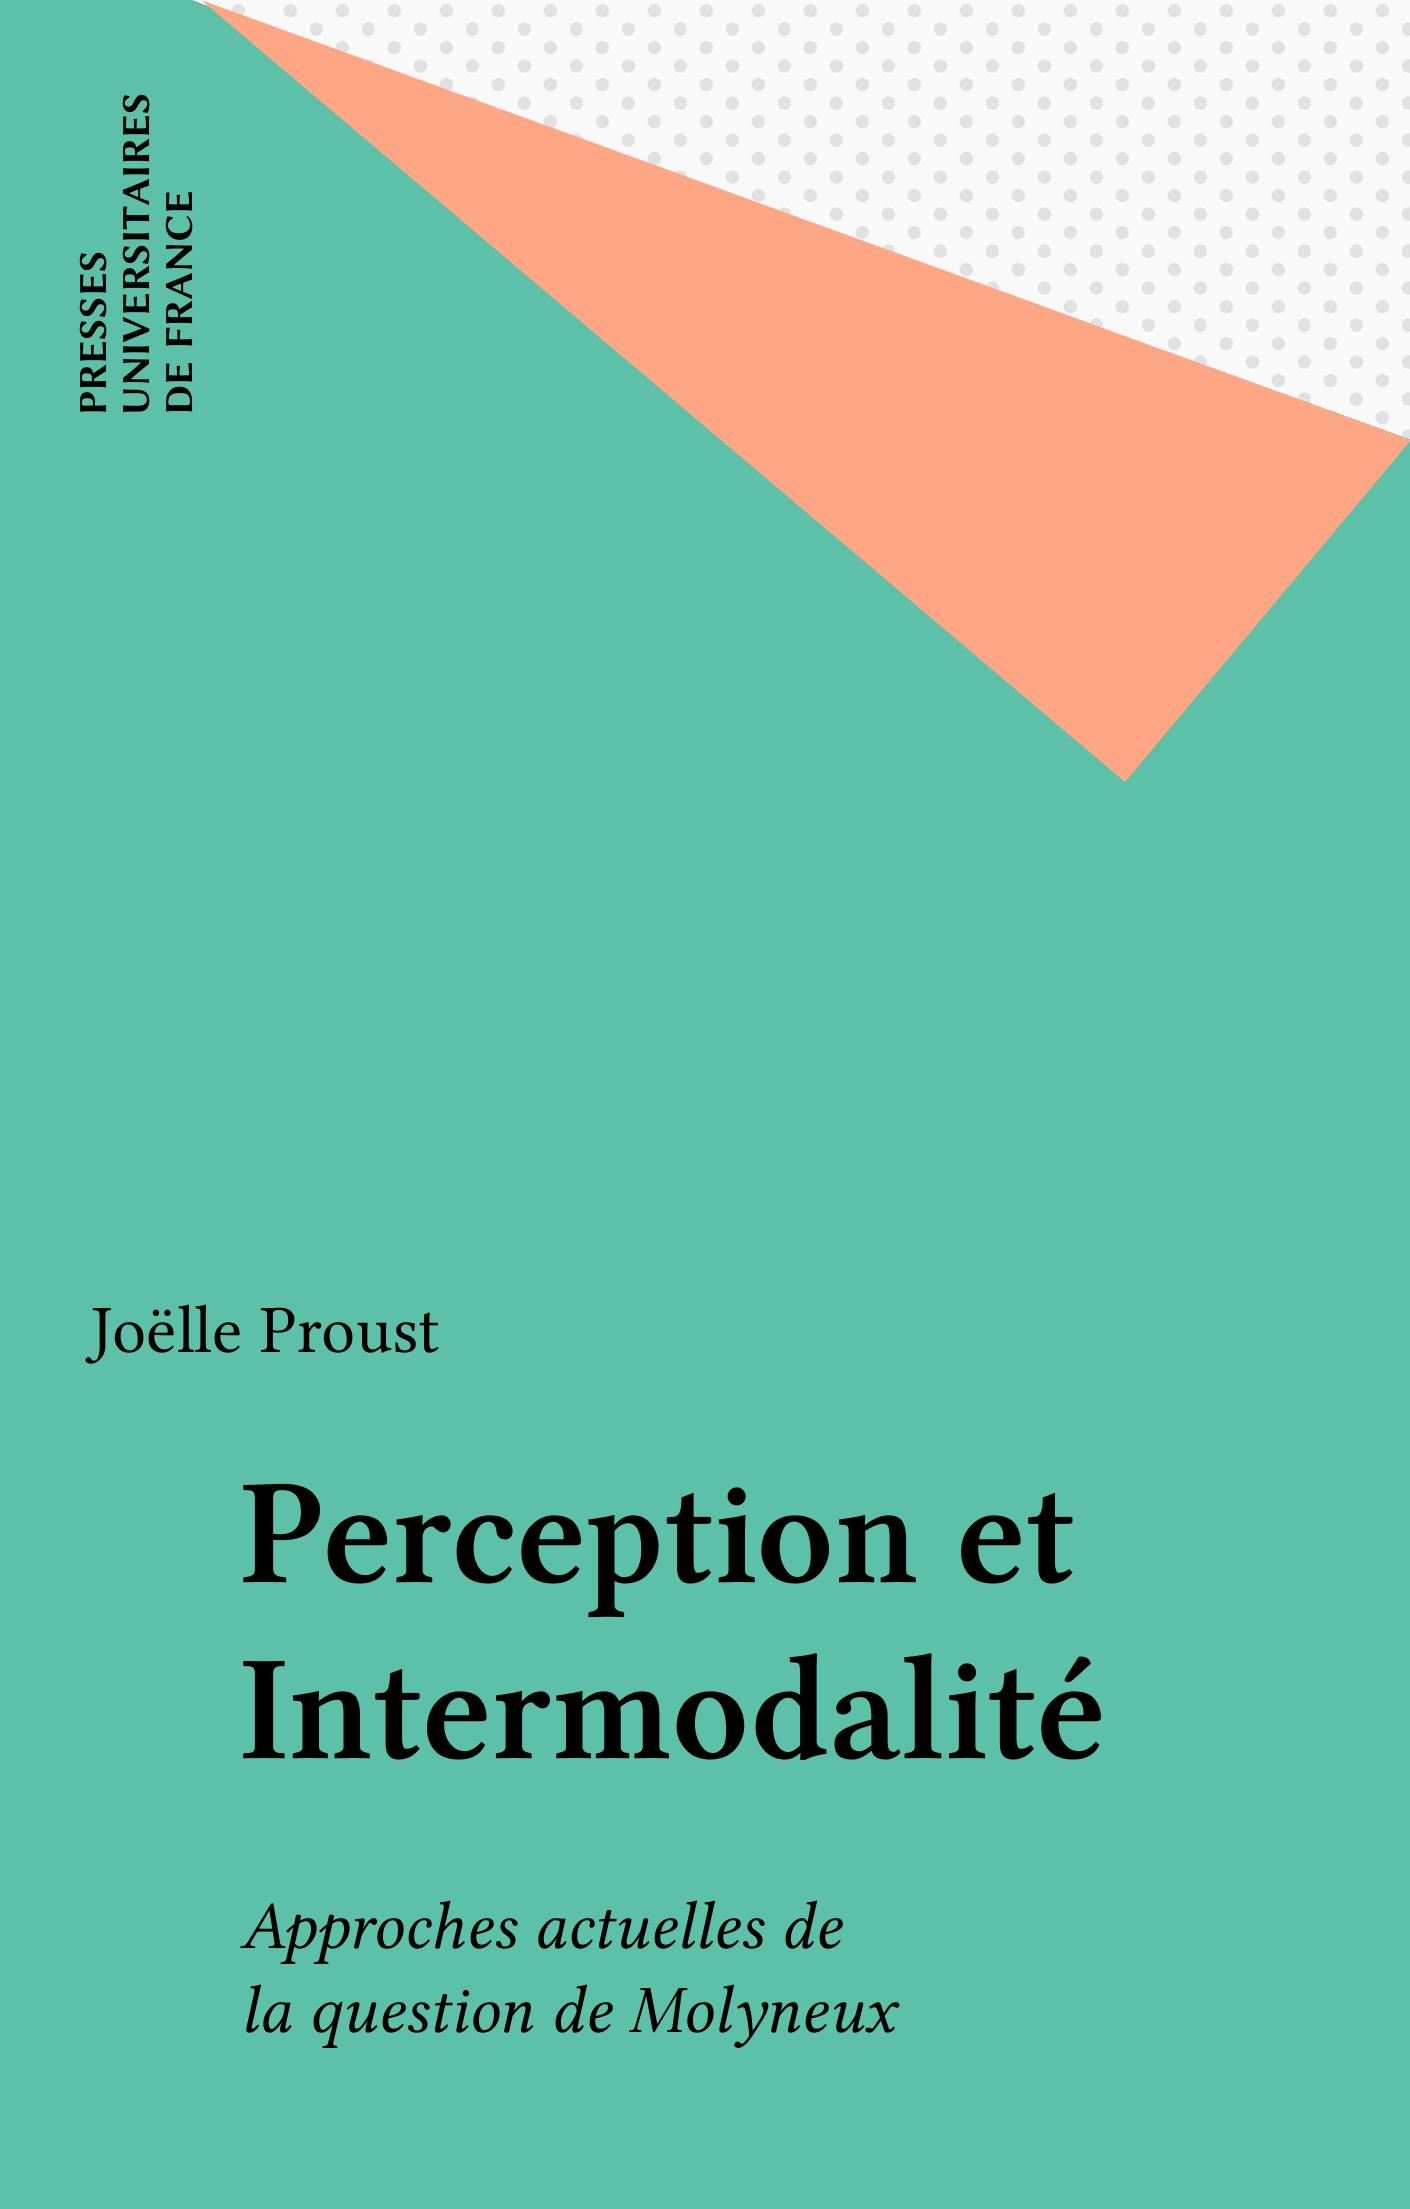 Perception et Intermodalité